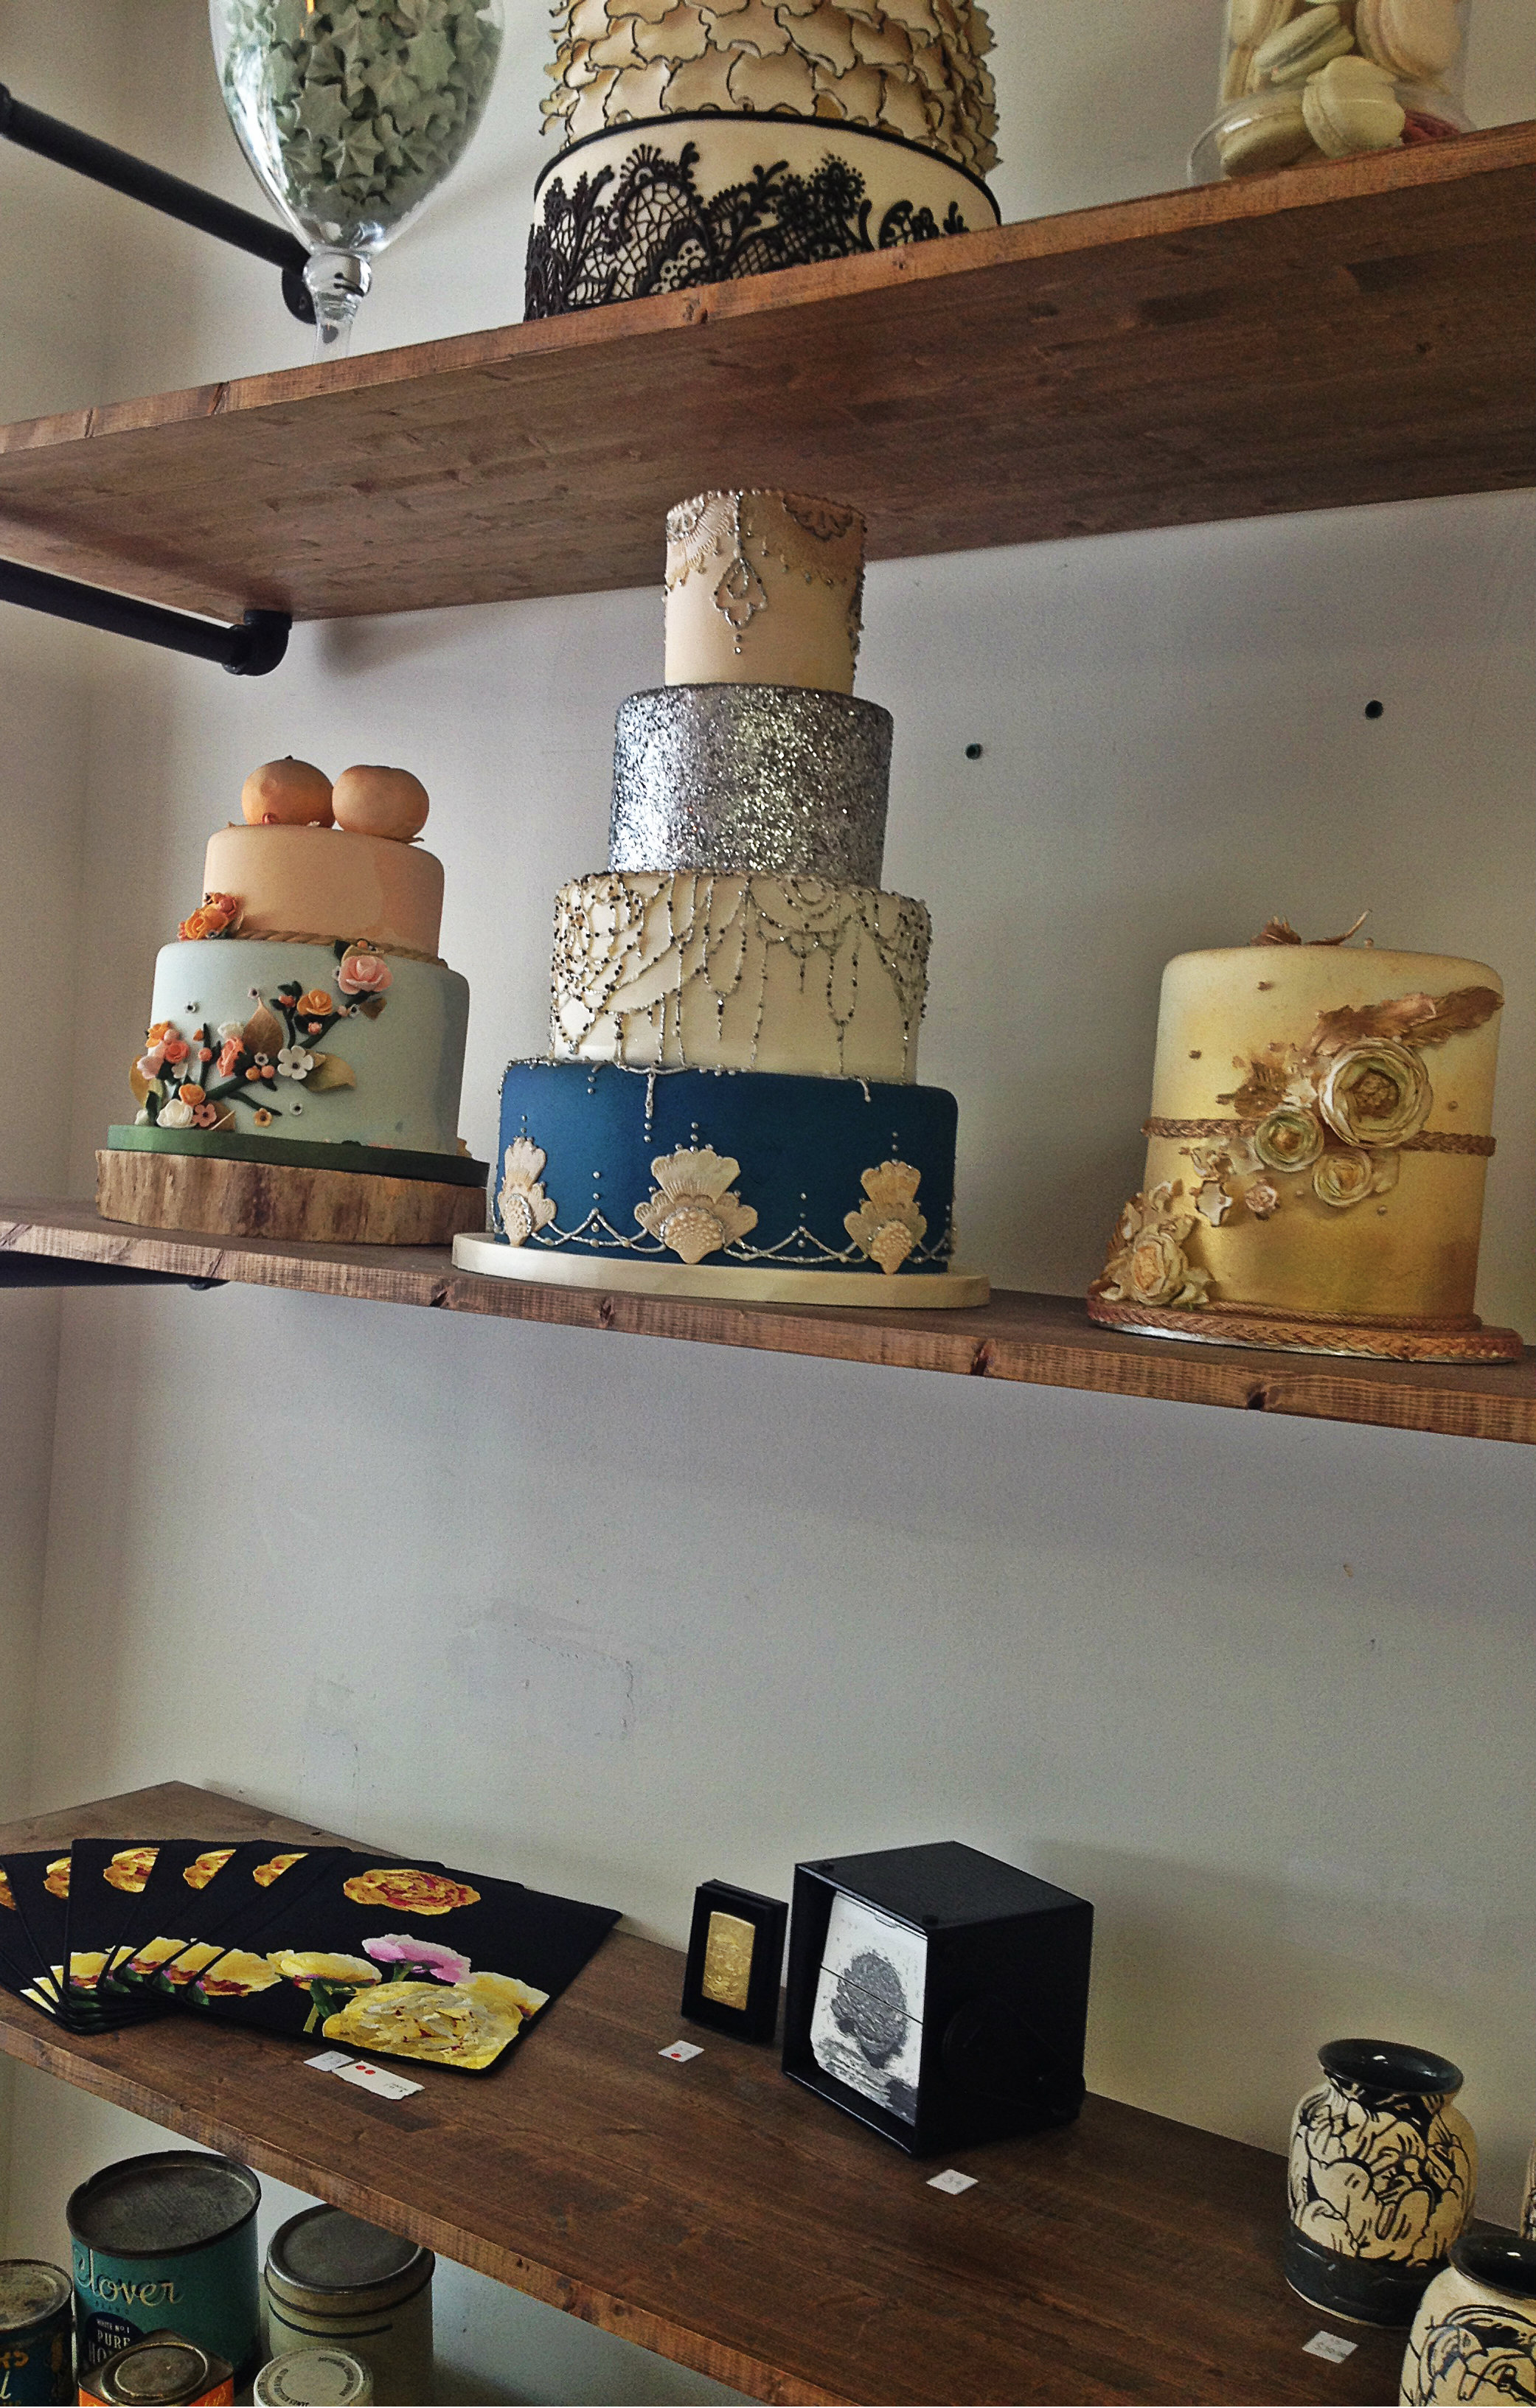 Honey Bake Shop | Cake Display